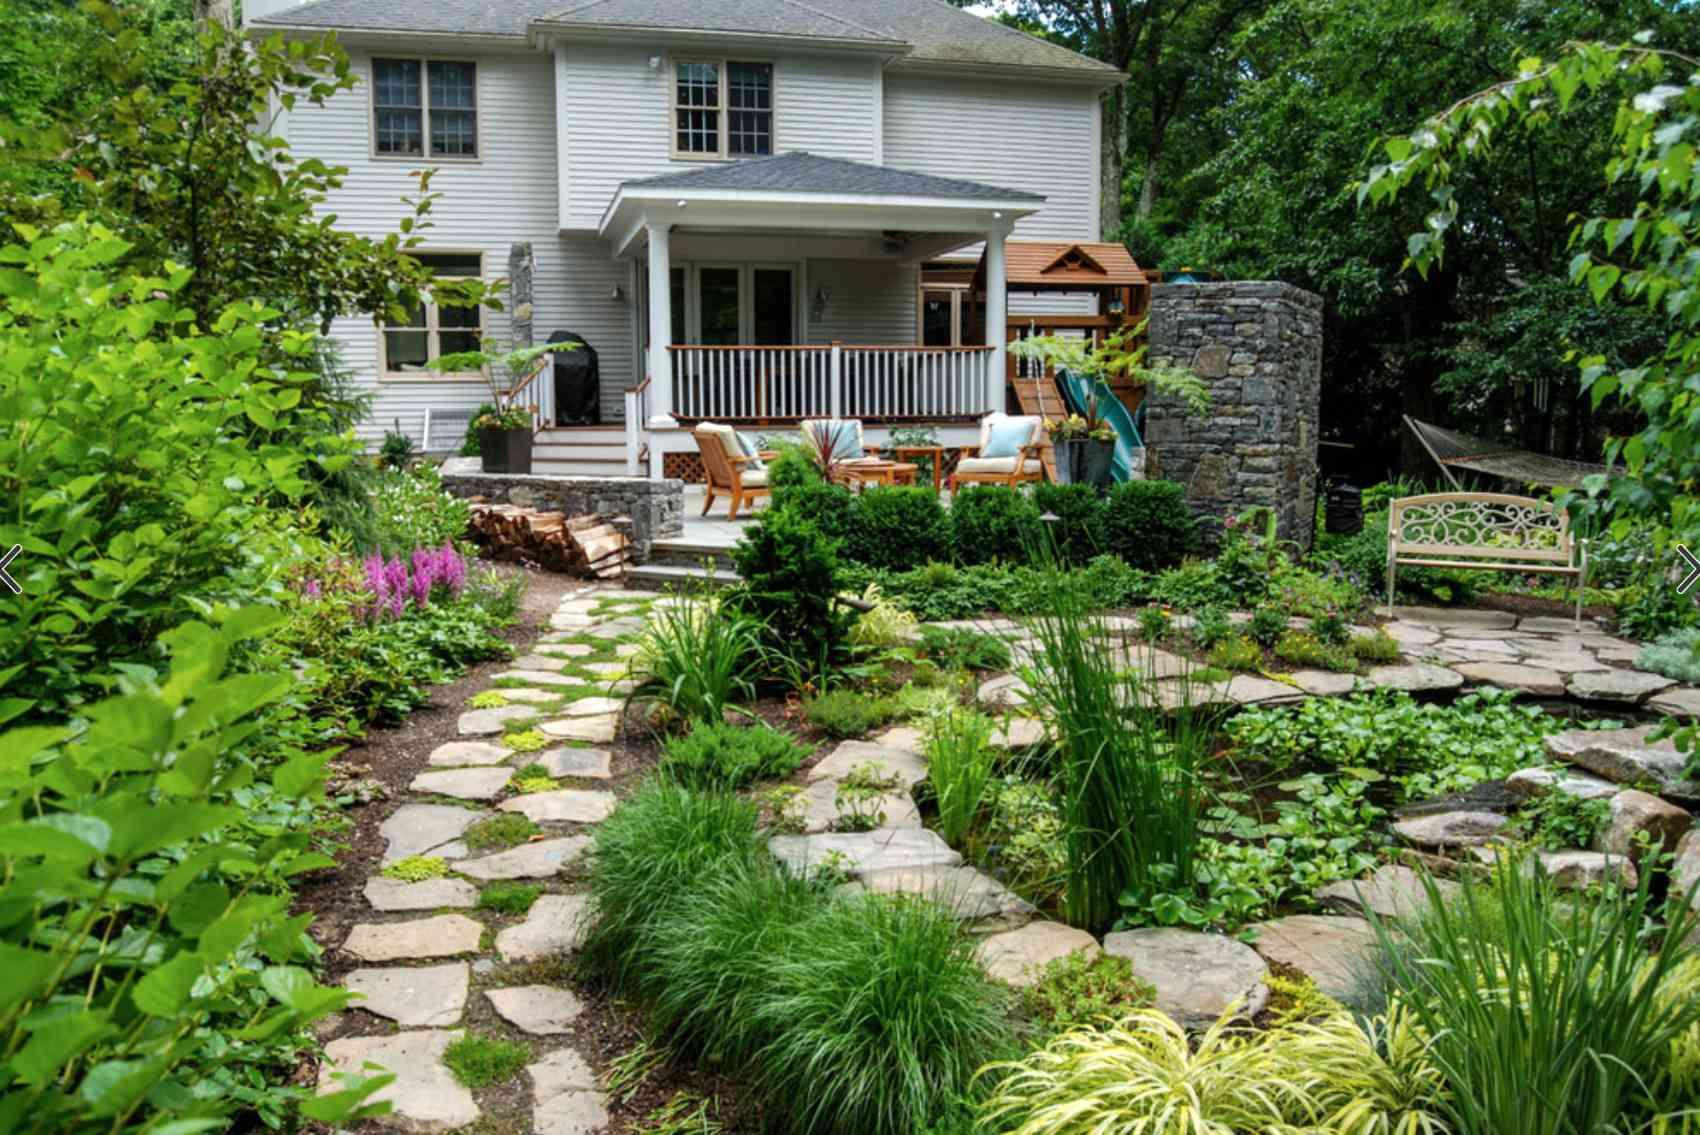 Pebble path design